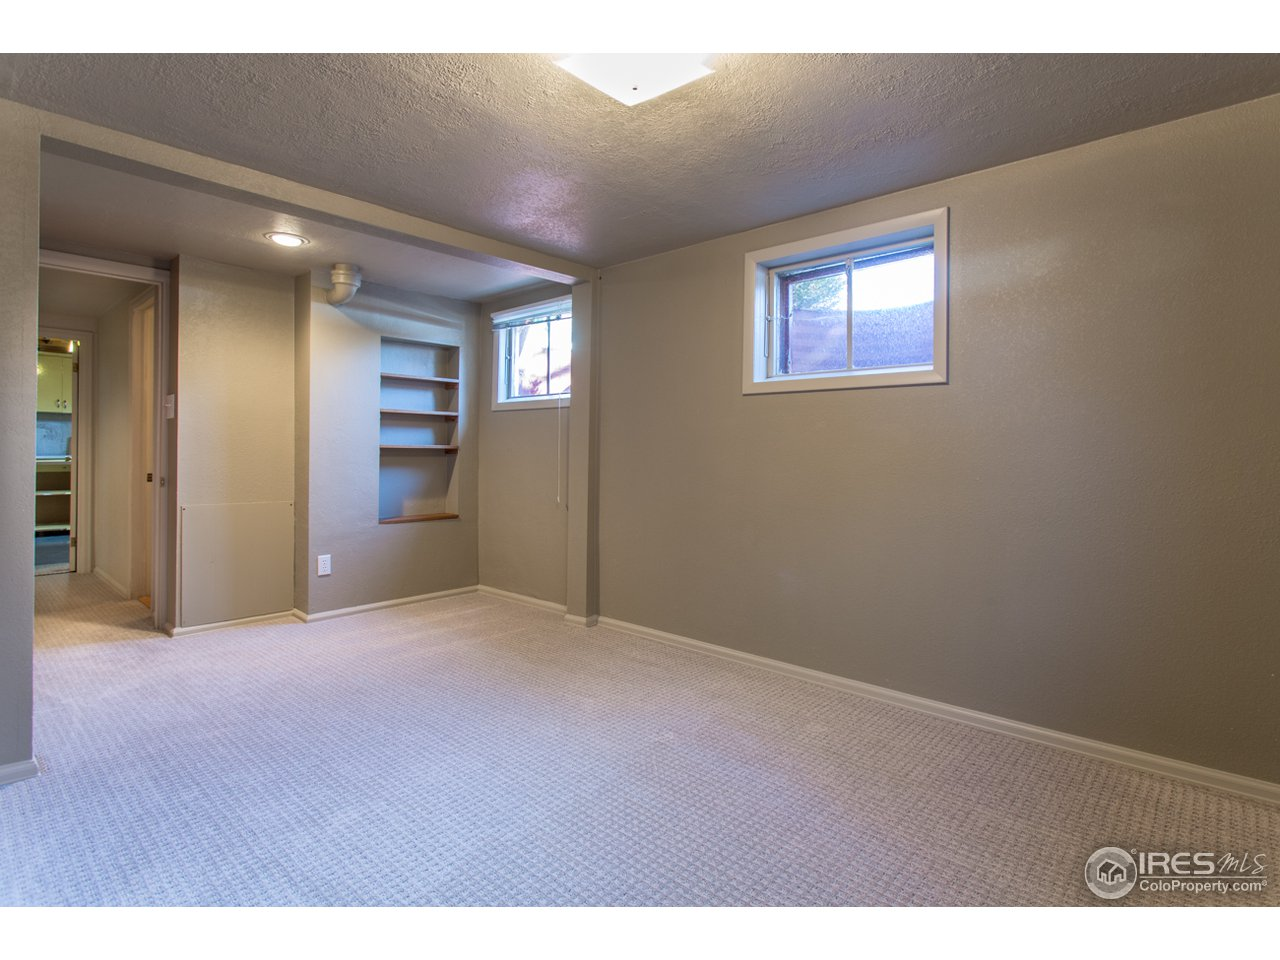 4th bedroom (basement)